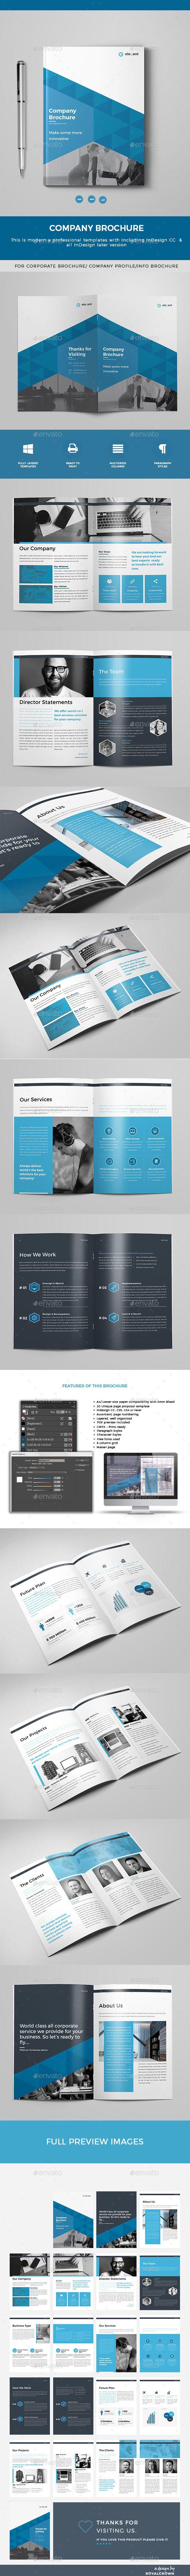 Brochure  — InDesign Template #template #design #brochure #business…